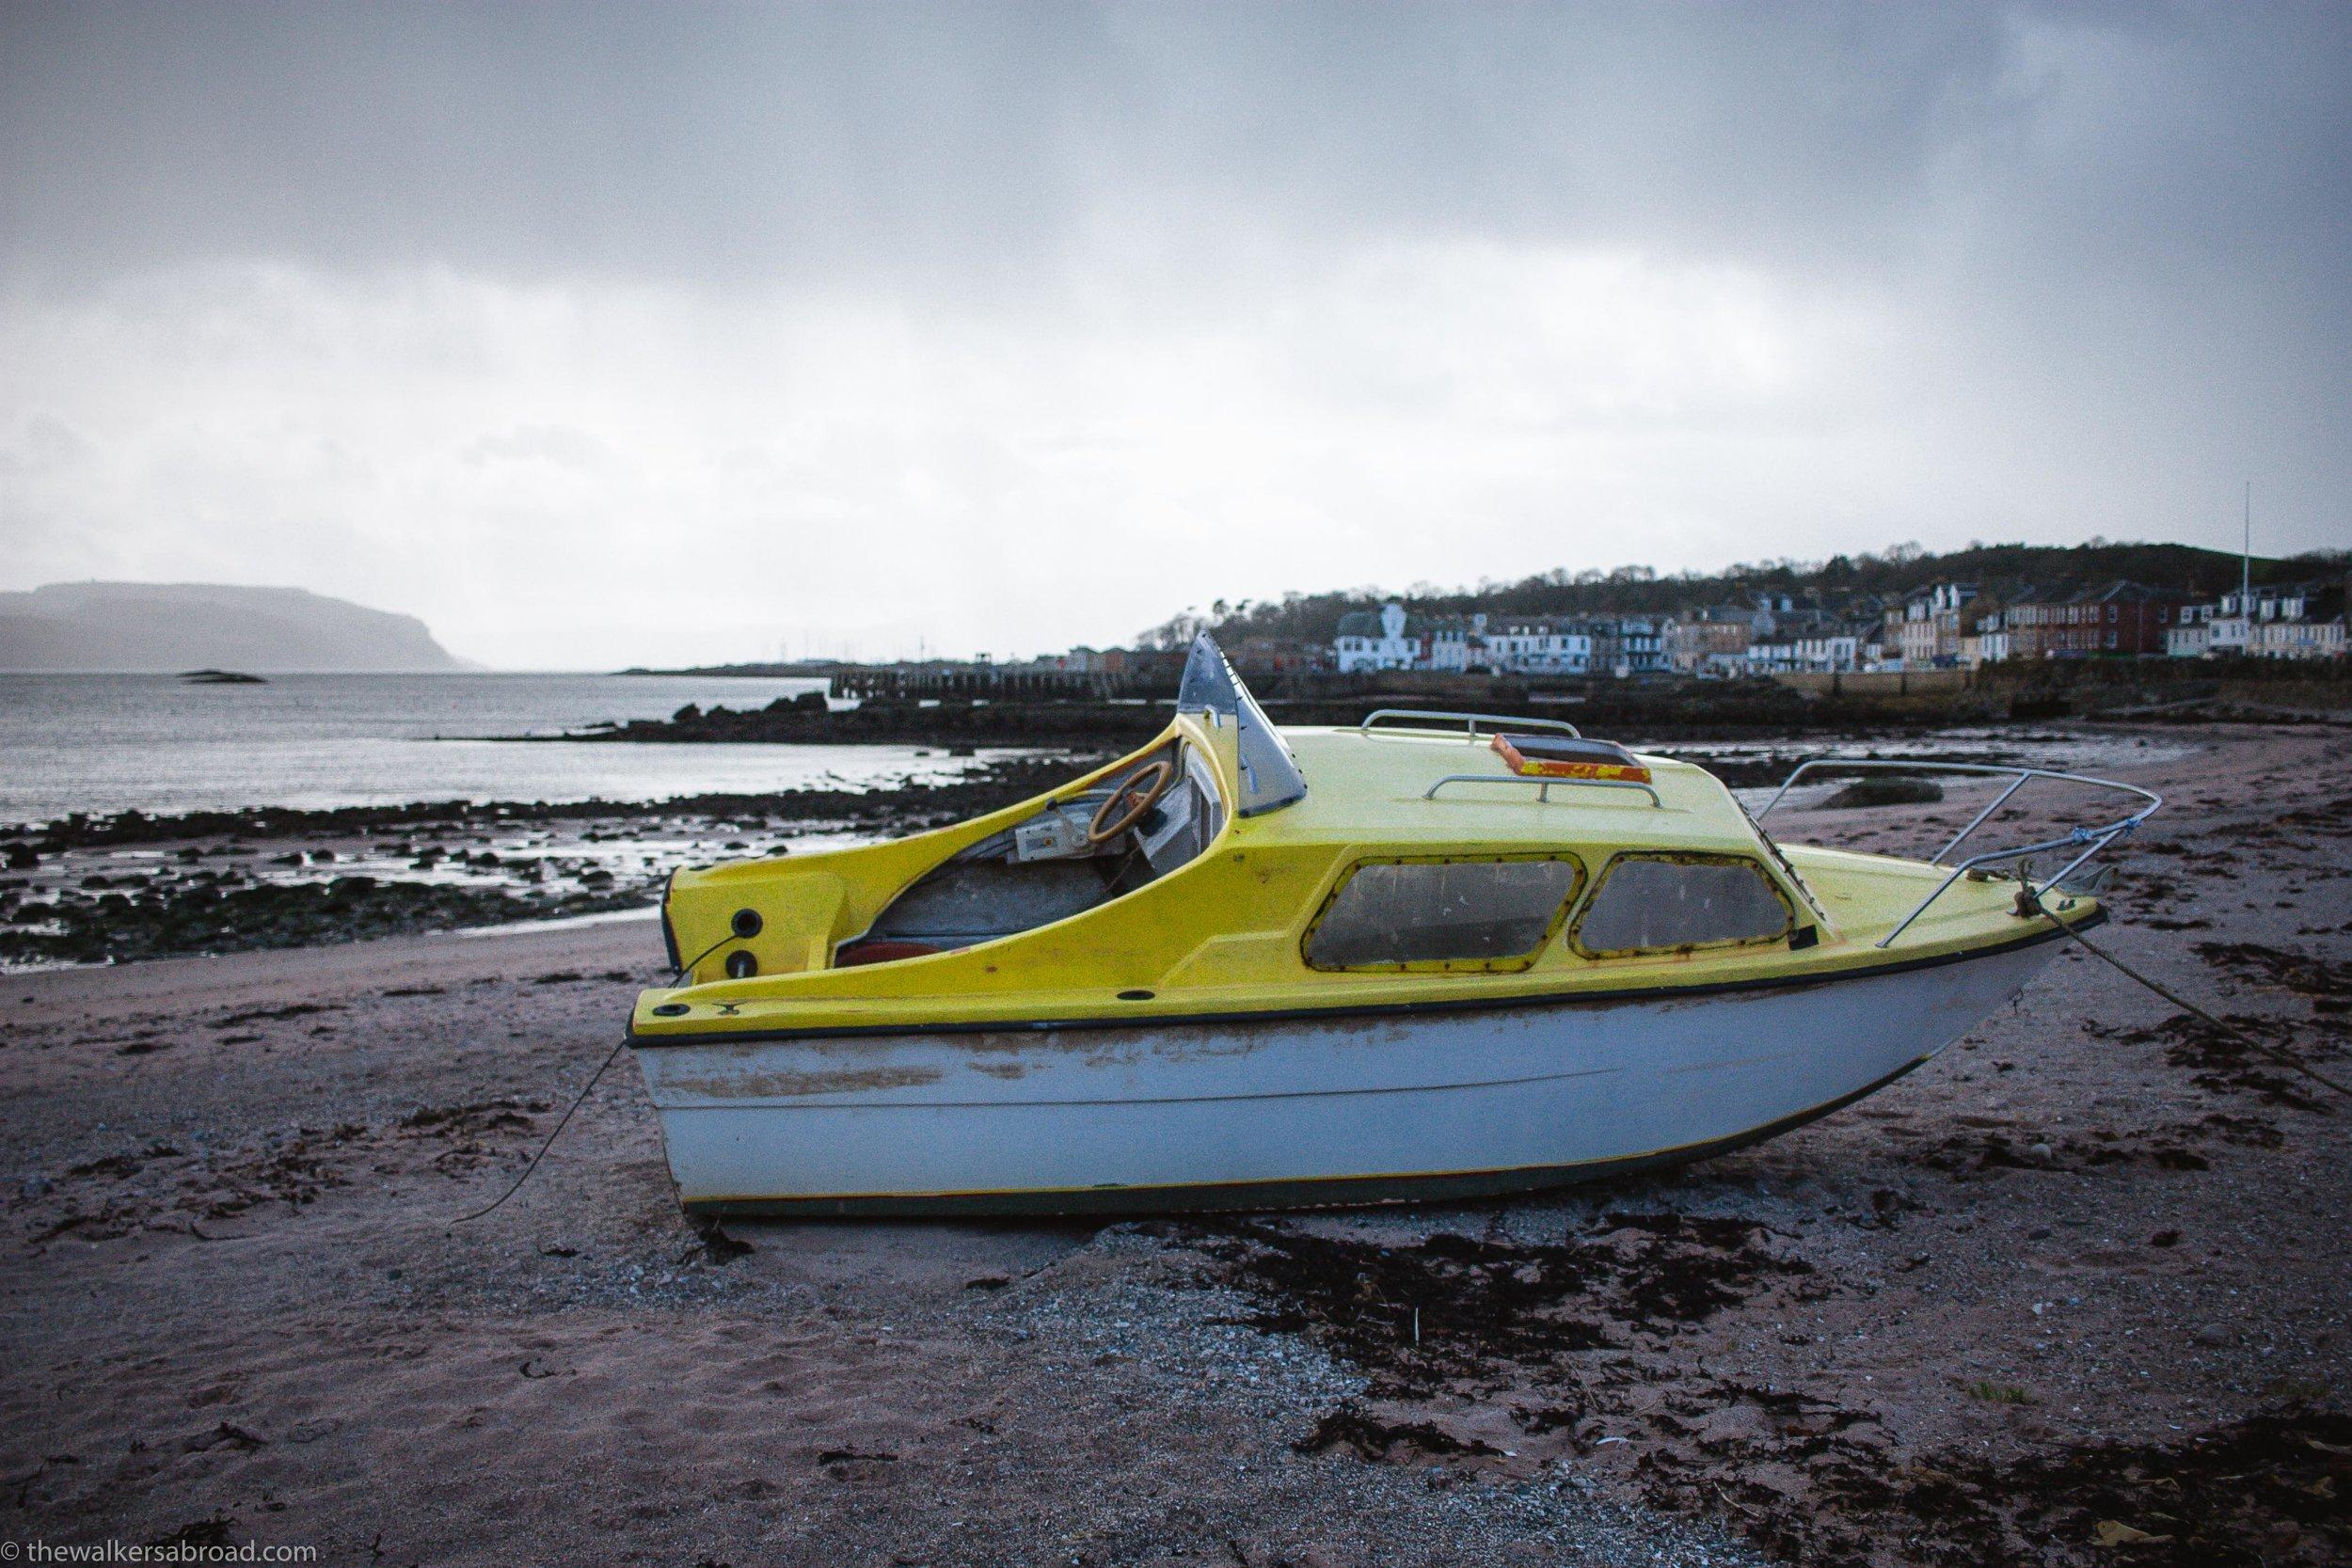 Yellow Boat Cumbrae Millport Scotland Island